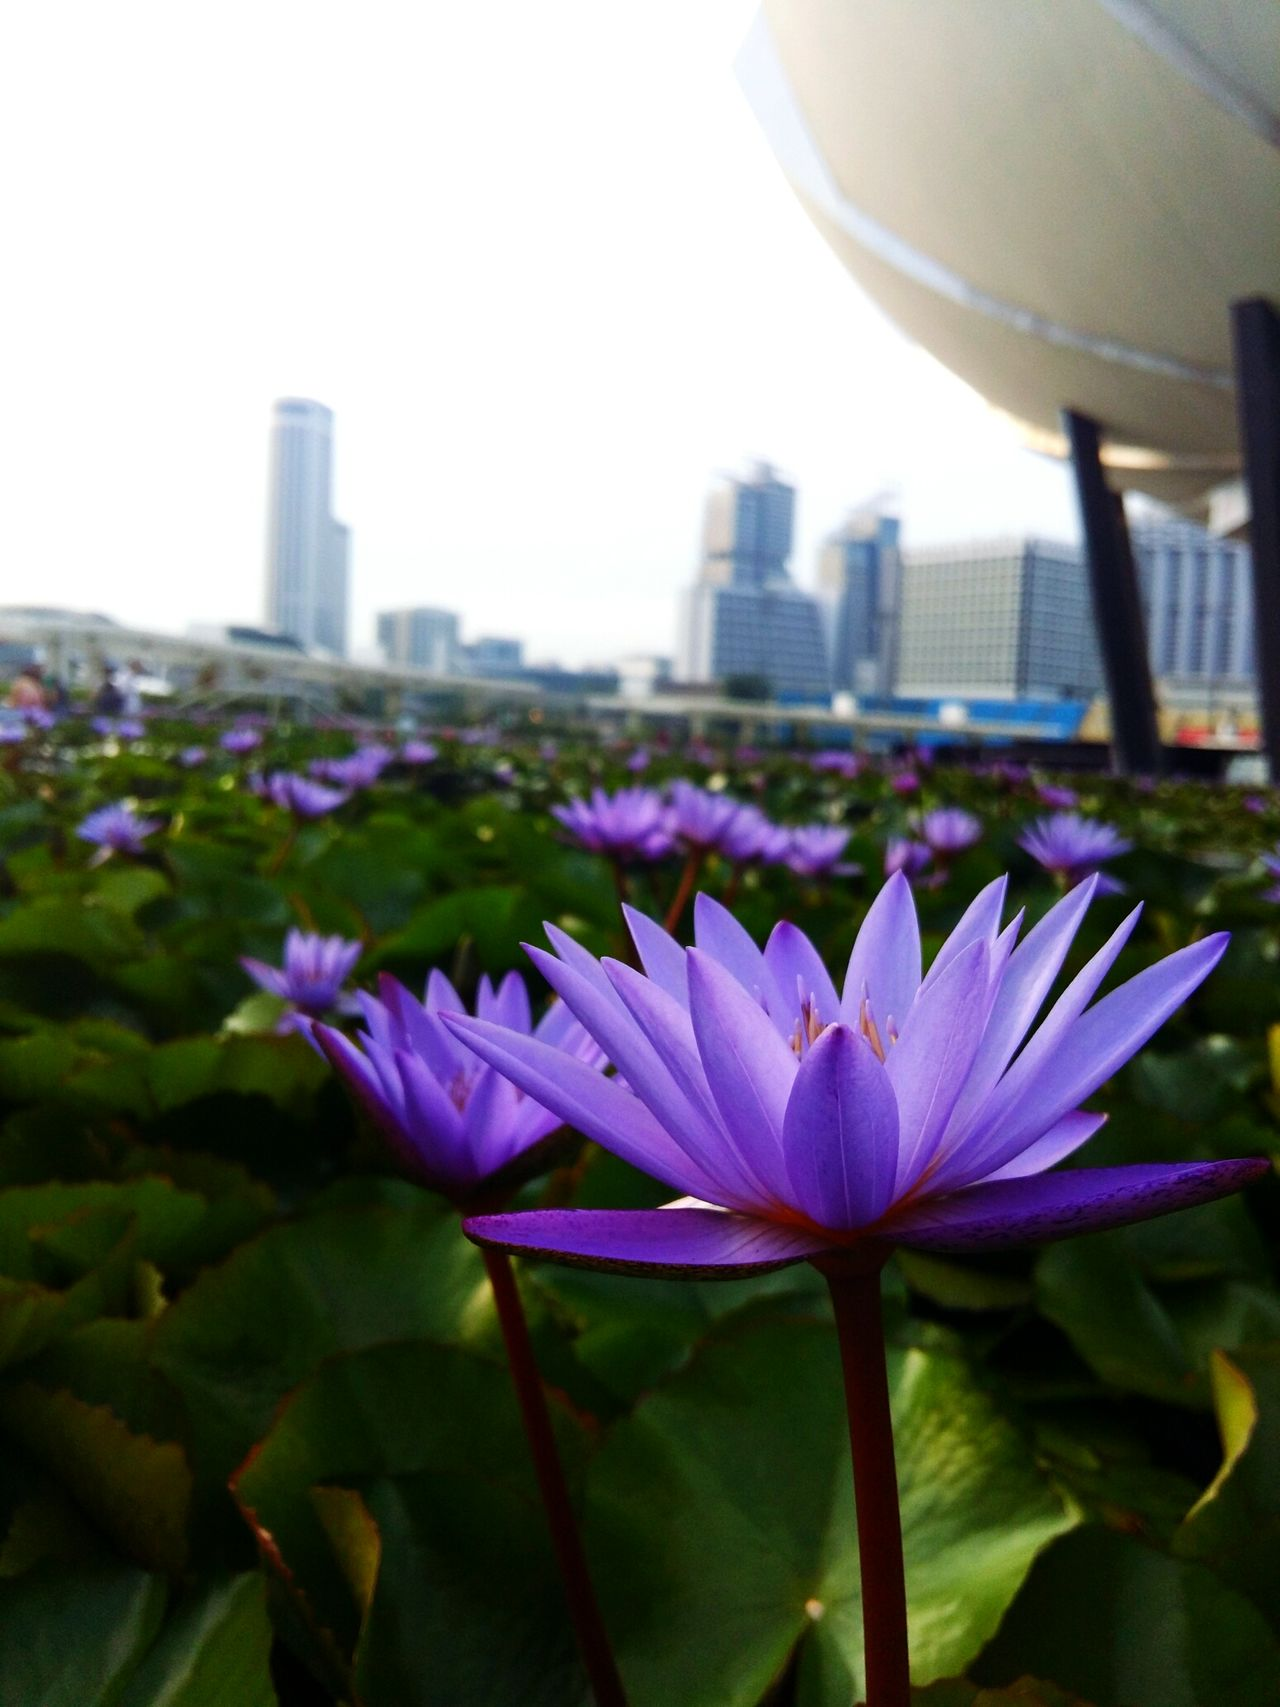 Singapore City Singapore View Singapore Marina Bay Sands Flowerphotography EyeEmGalley EyeEmNewHere EyeEmFlower Eyeemmarket Eyeem2017